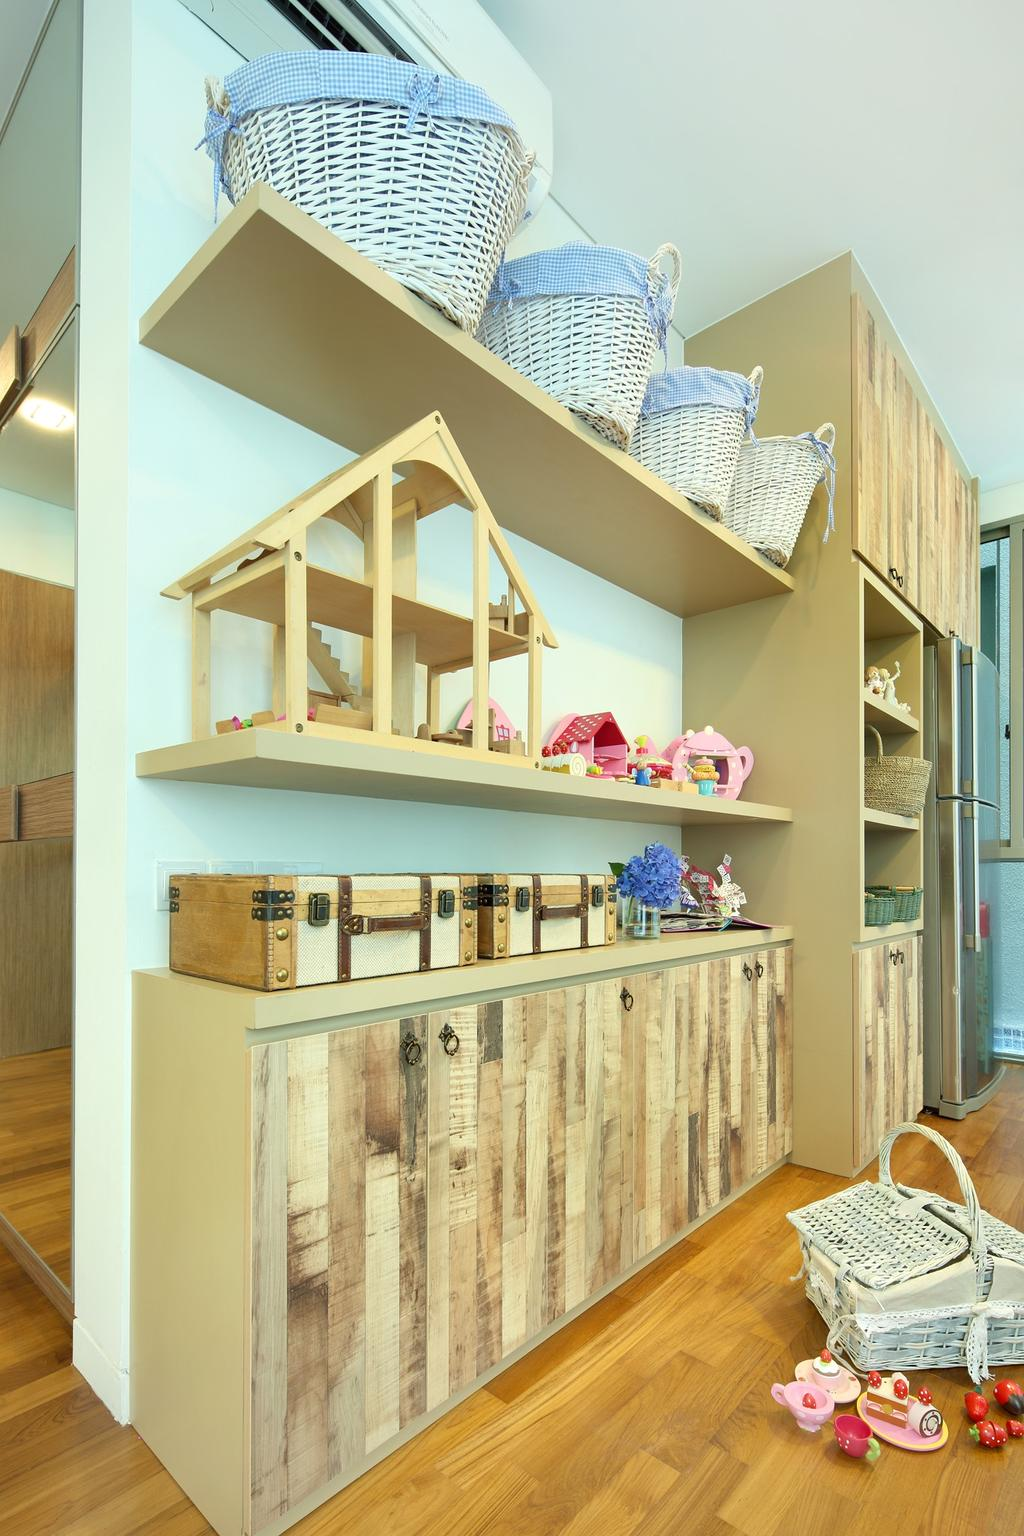 Contemporary, Condo, 56 St Patrick Road, Interior Designer, Space Define Interior, Shelves, Cubbyholes, Cabinet, Storage, Woodwork, Wood, Laminate, Wood Laminate, Parquet, Bookcase, Furniture